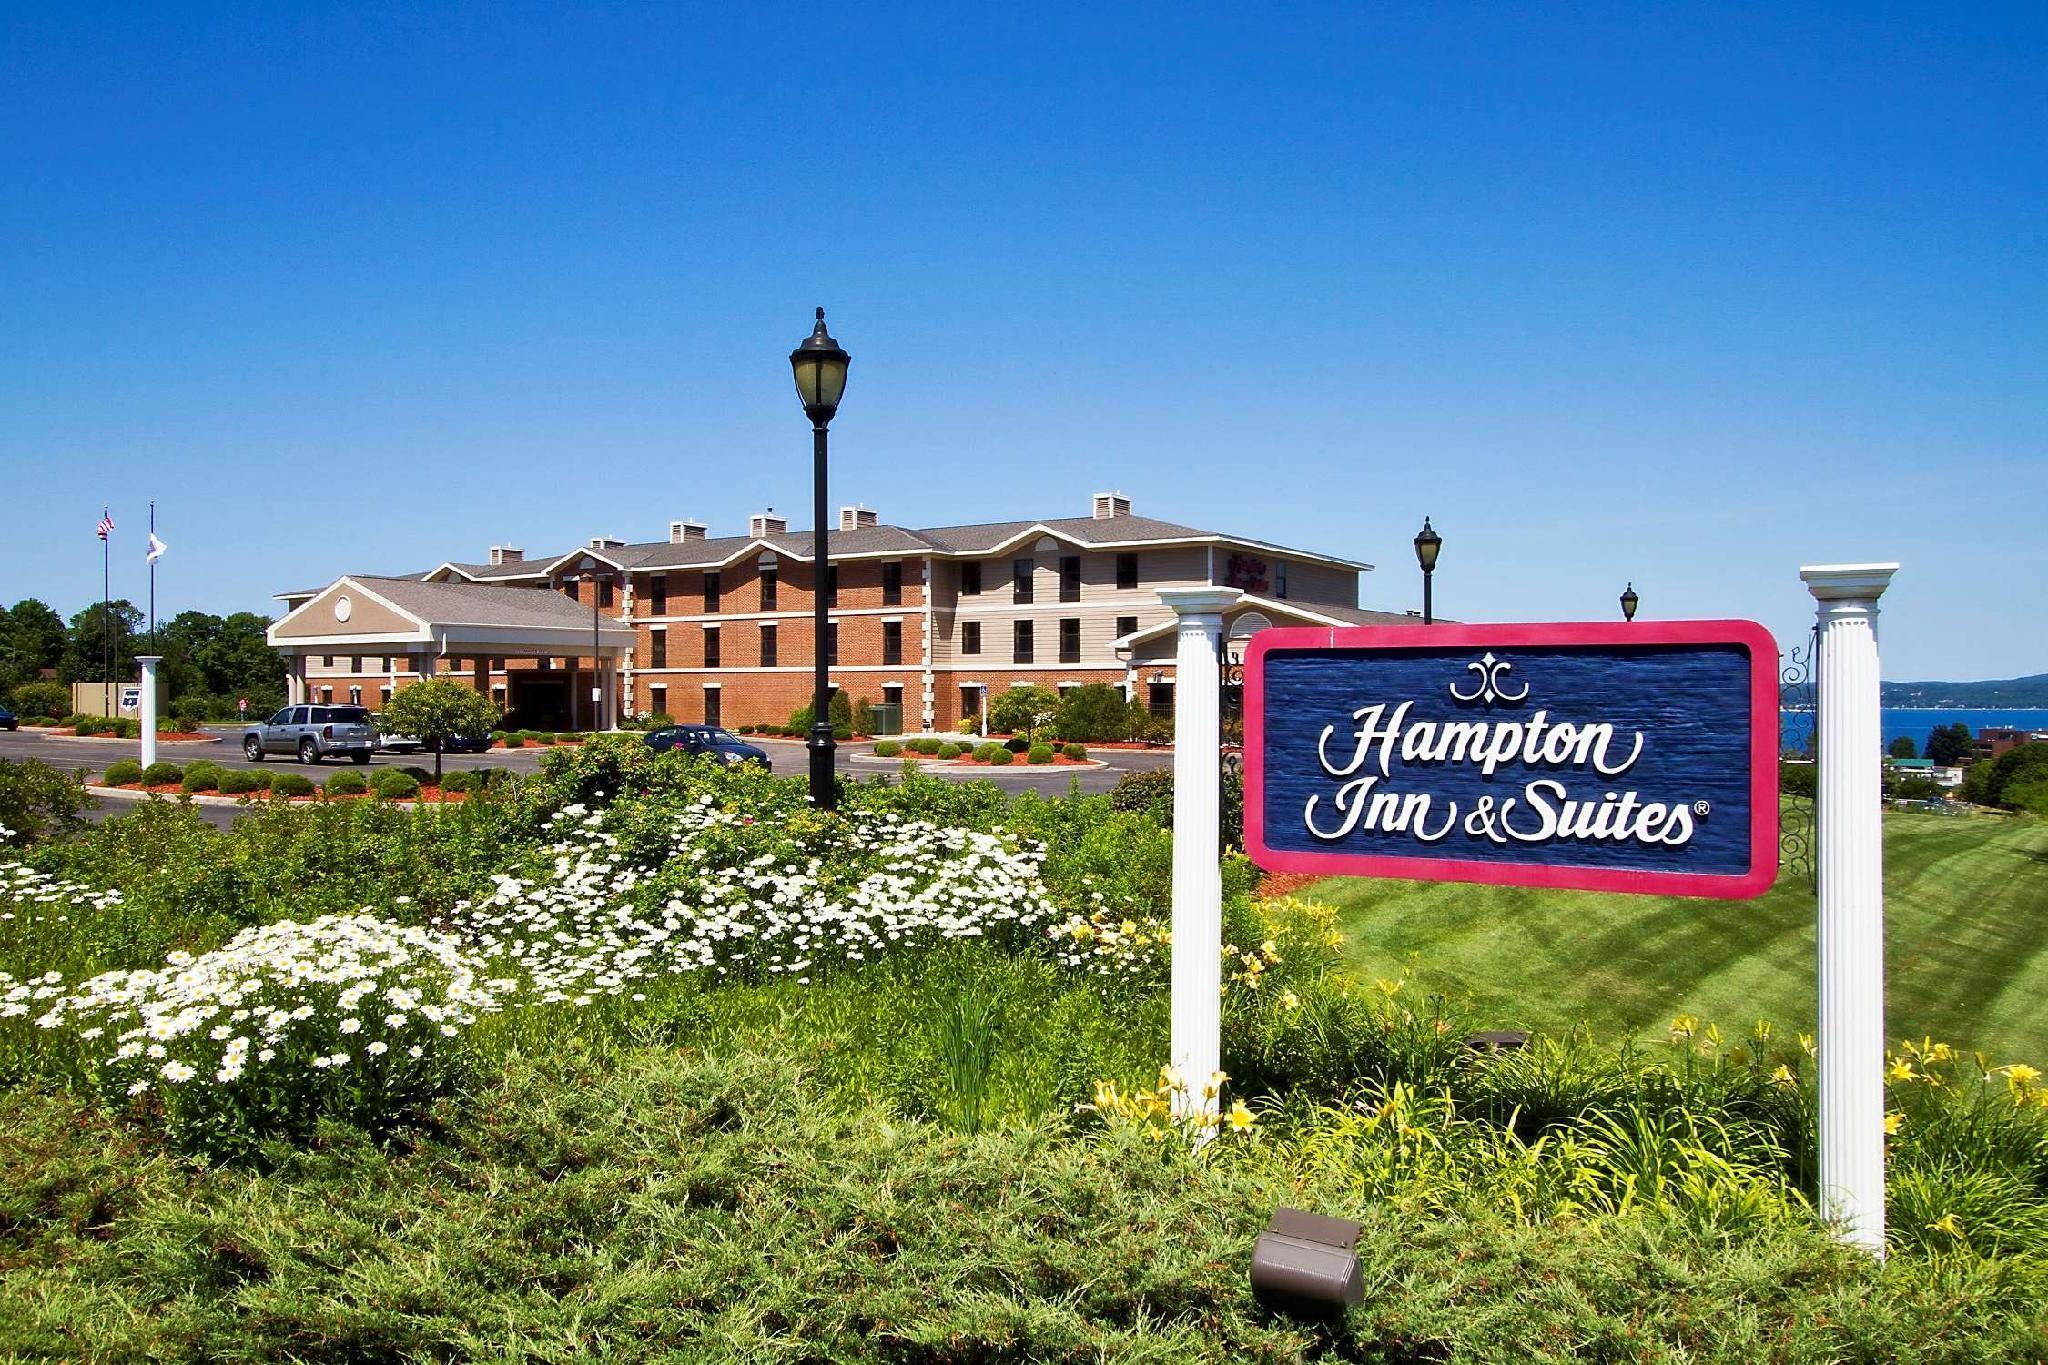 Hampton Inn And Suites Petoskey